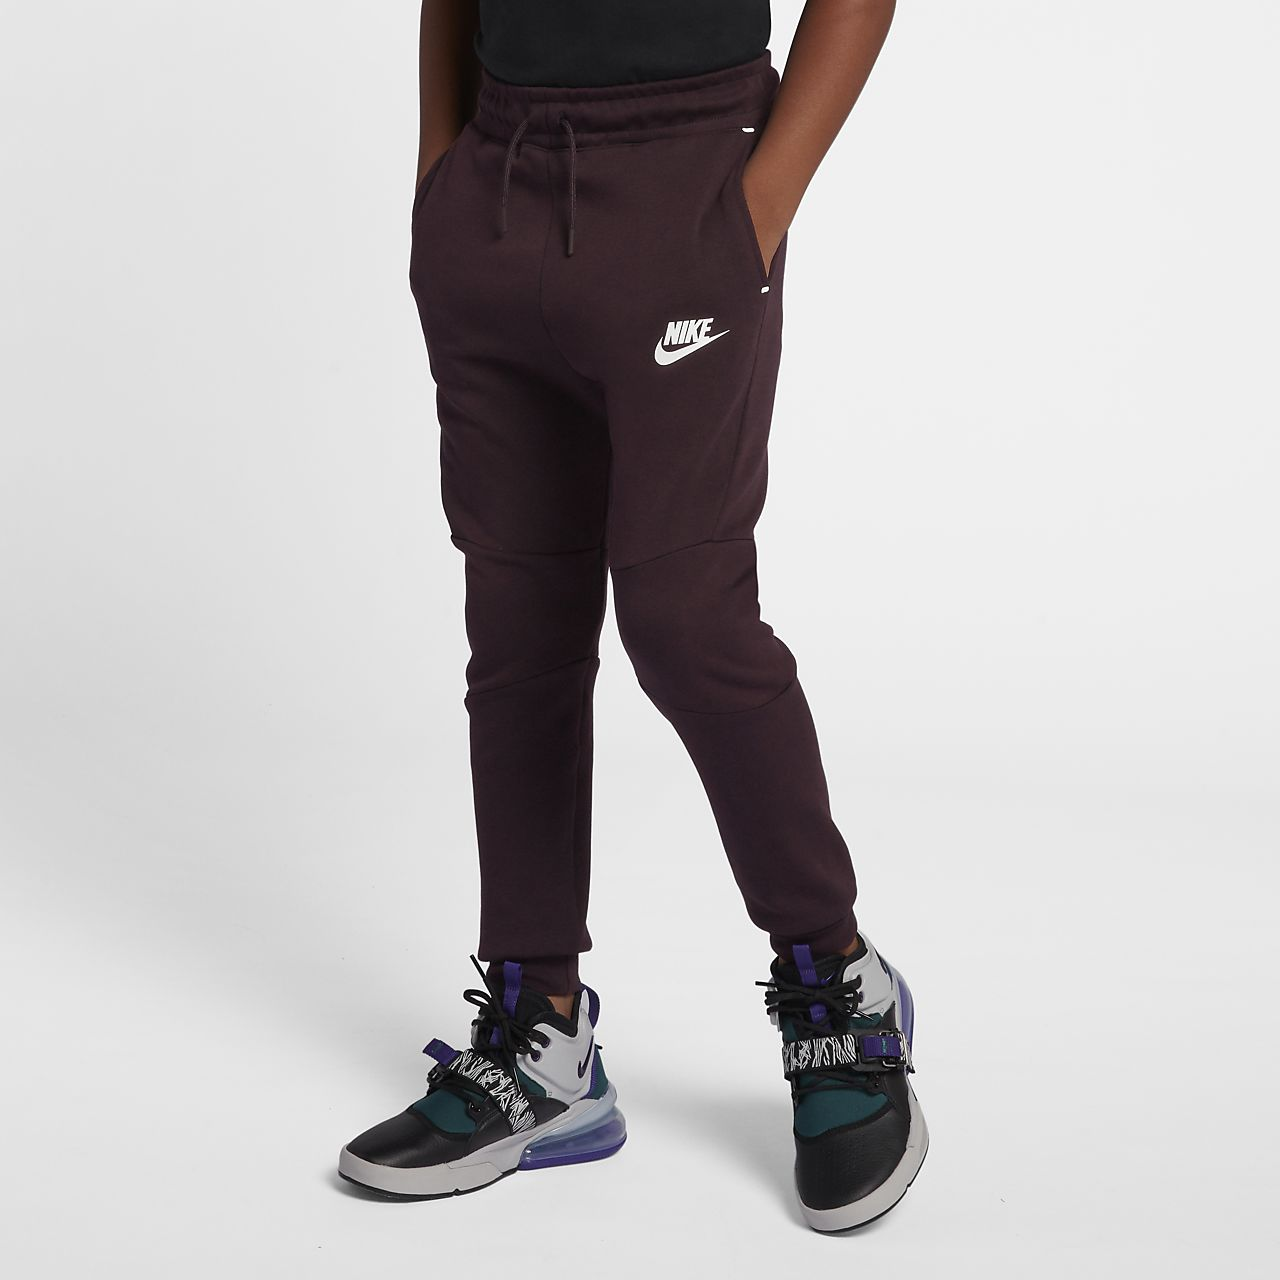 official photos 3c101 b5ad5 Pantalon Fleece Sportswear Garçon Âgé Pour Tech Nike Plus Zq